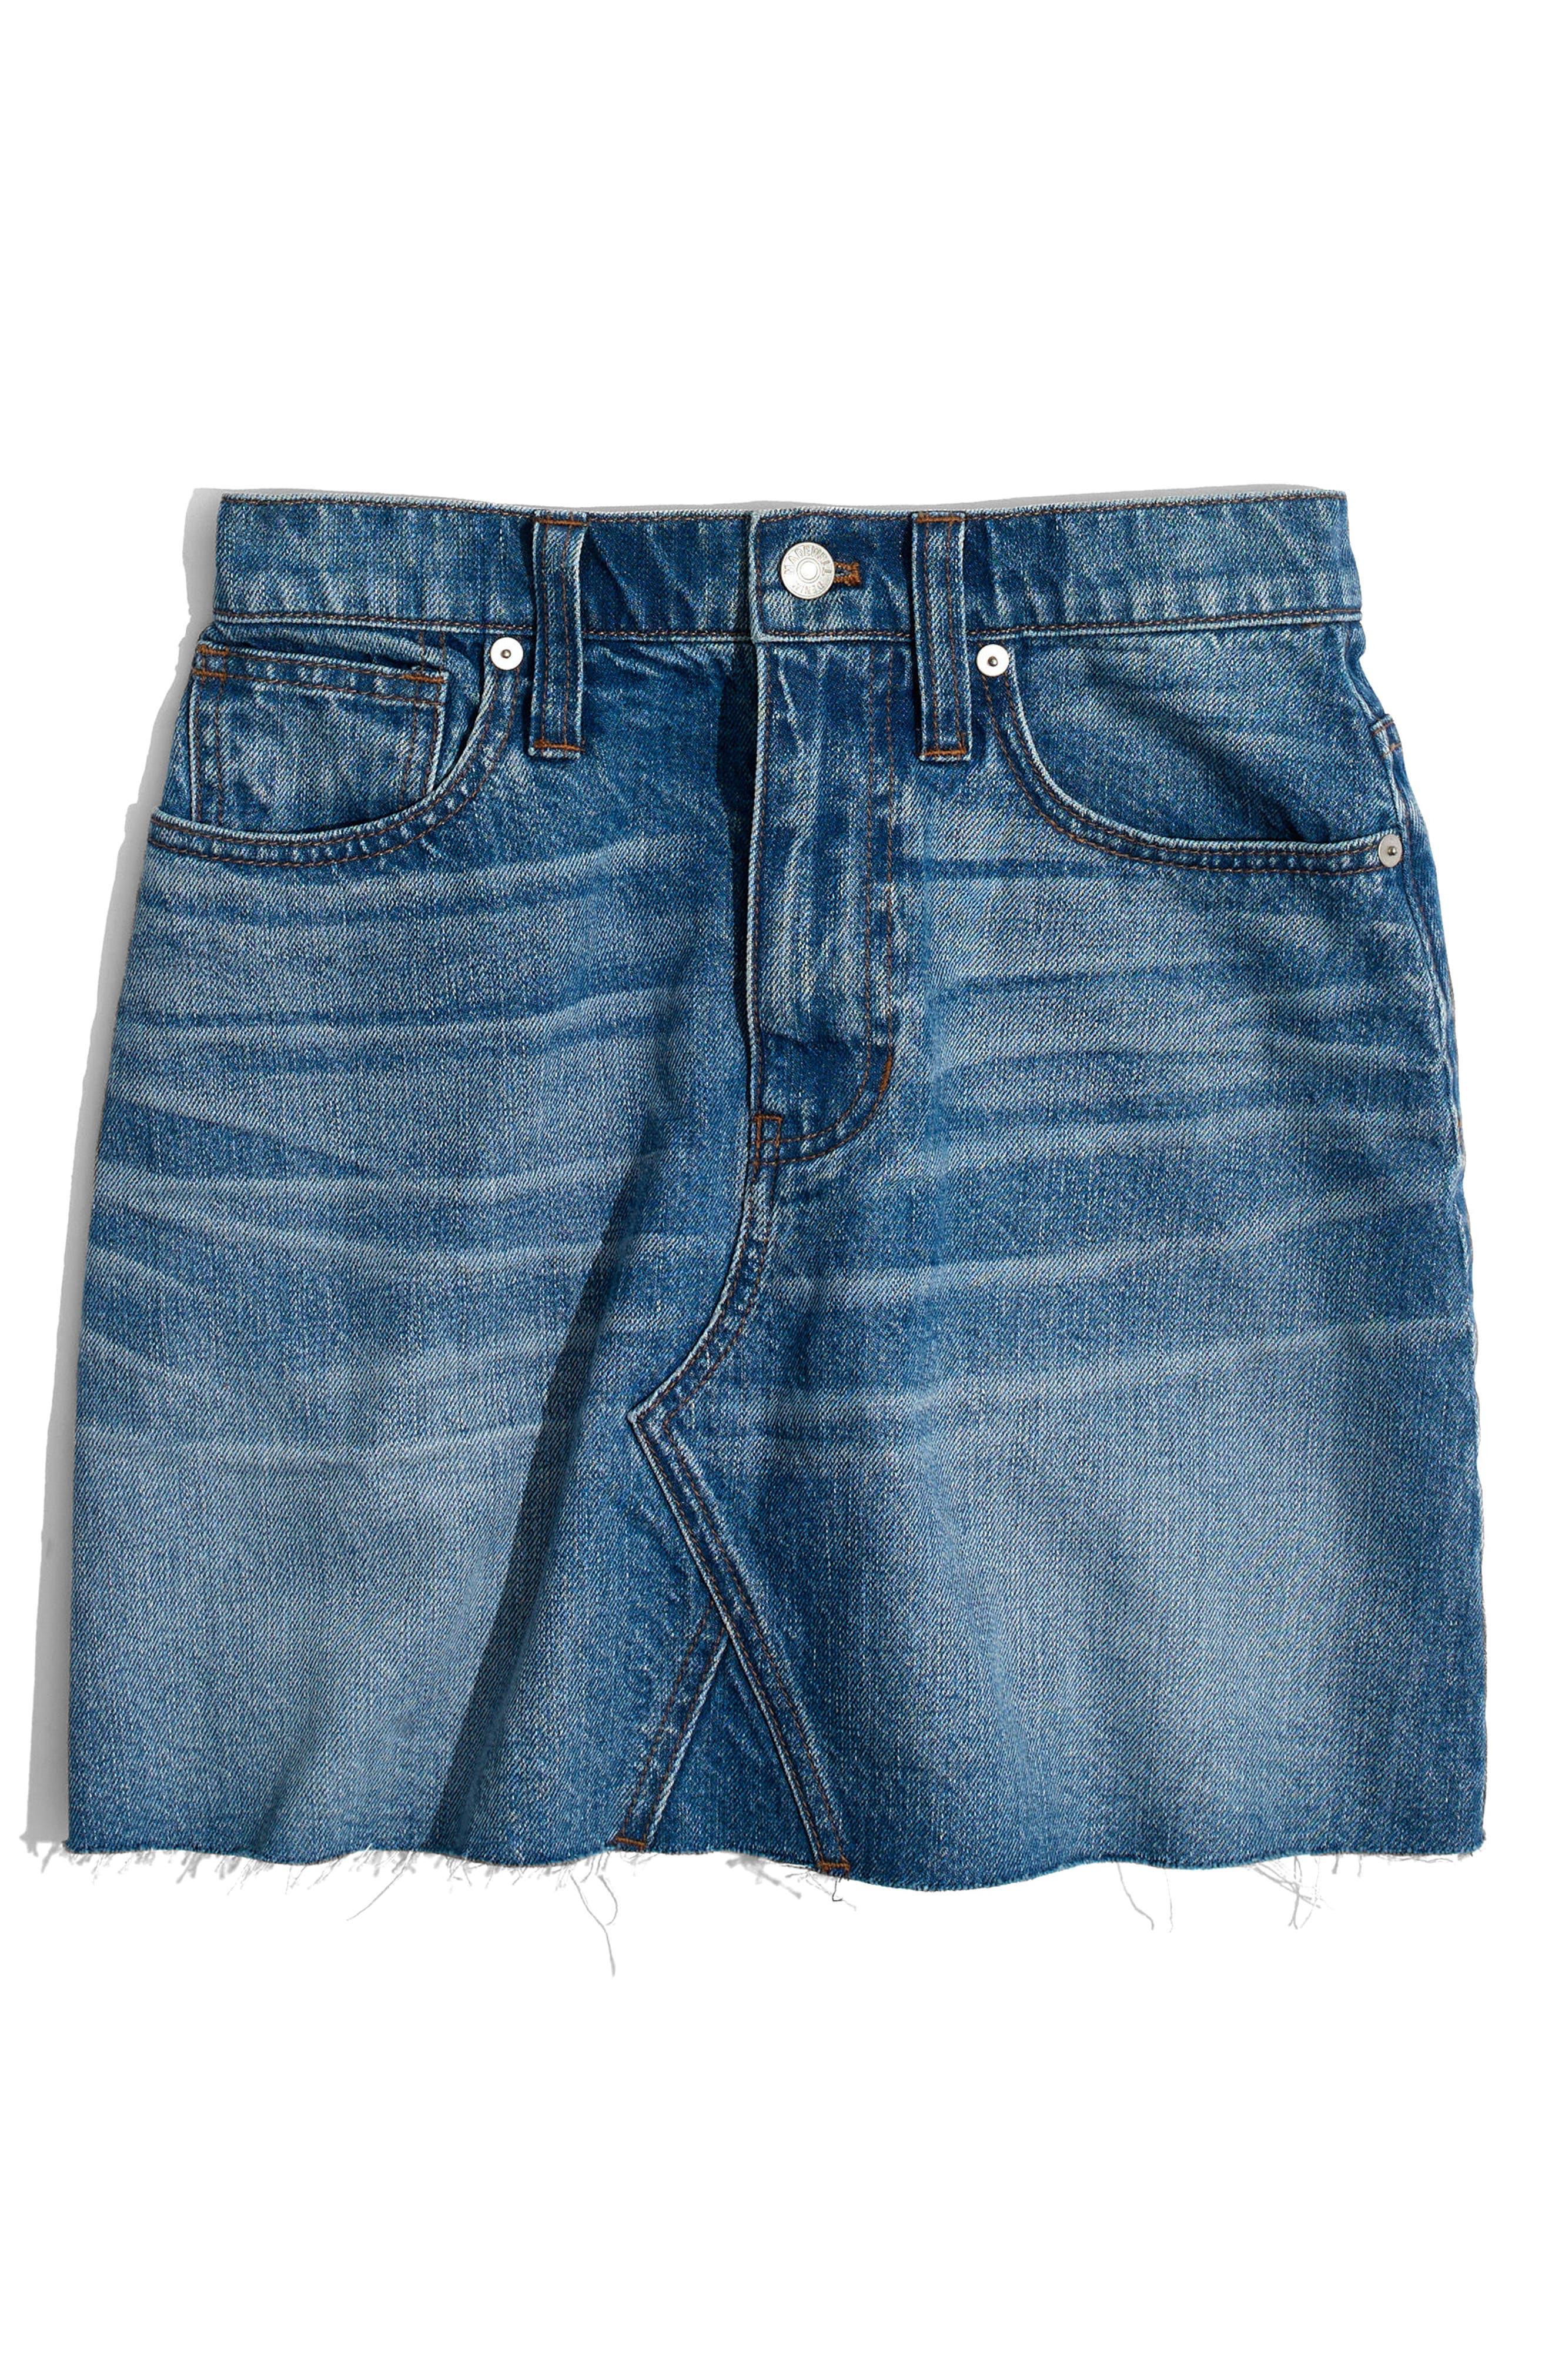 Frisco Denim Miniskirt,                             Alternate thumbnail 4, color,                             Leandra Wash